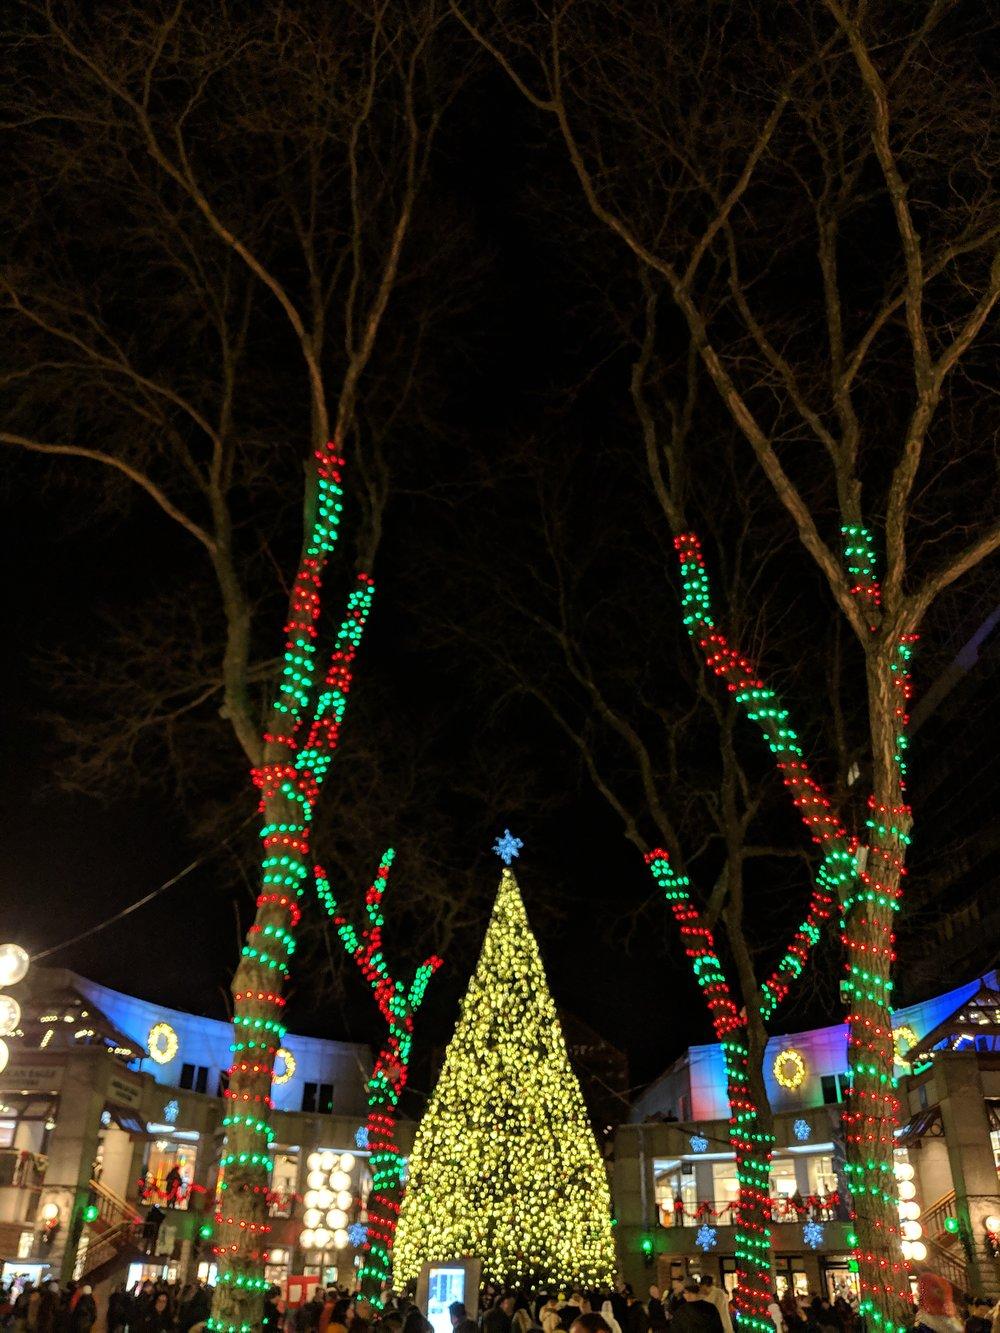 bri rinehart; photography; boston; Christmas; lights; faneuil